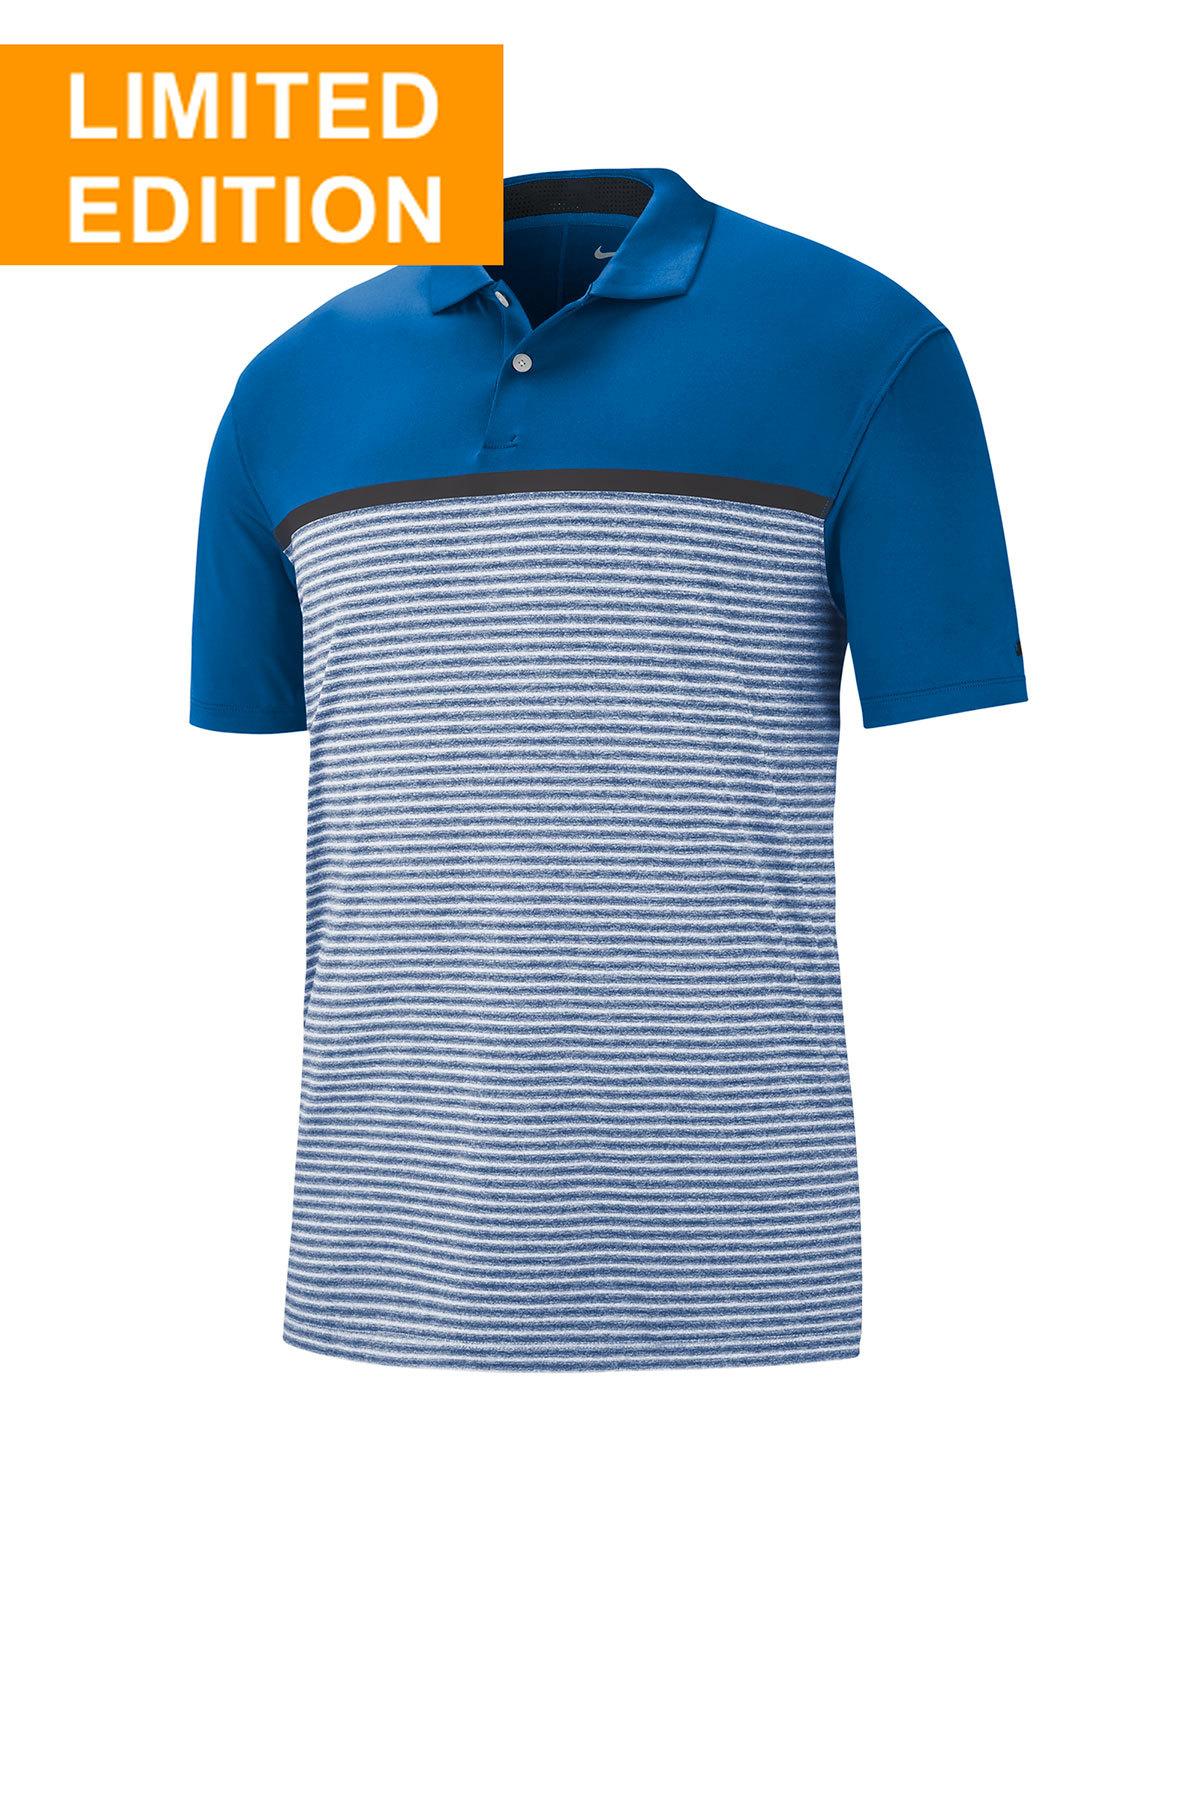 Nike Tiger Woods Vapor Stripe Polo | Polos/Knits | SanMar